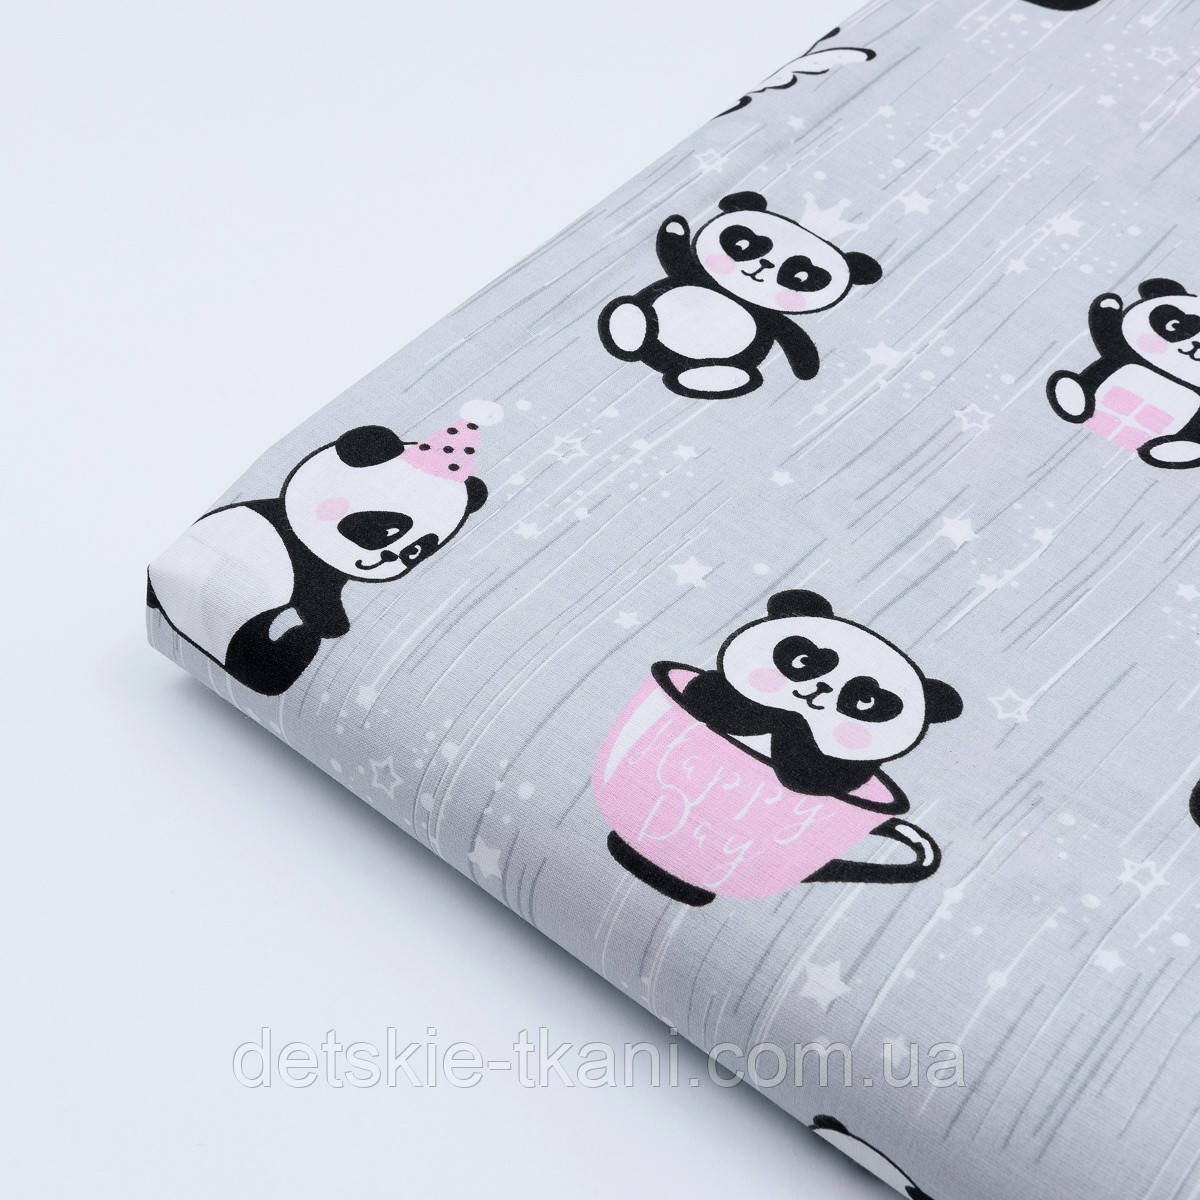 "Лоскут ткани ""Панды в чашках и звёздочки"" на серомом фоне, №1631а, разме 29*80 см"